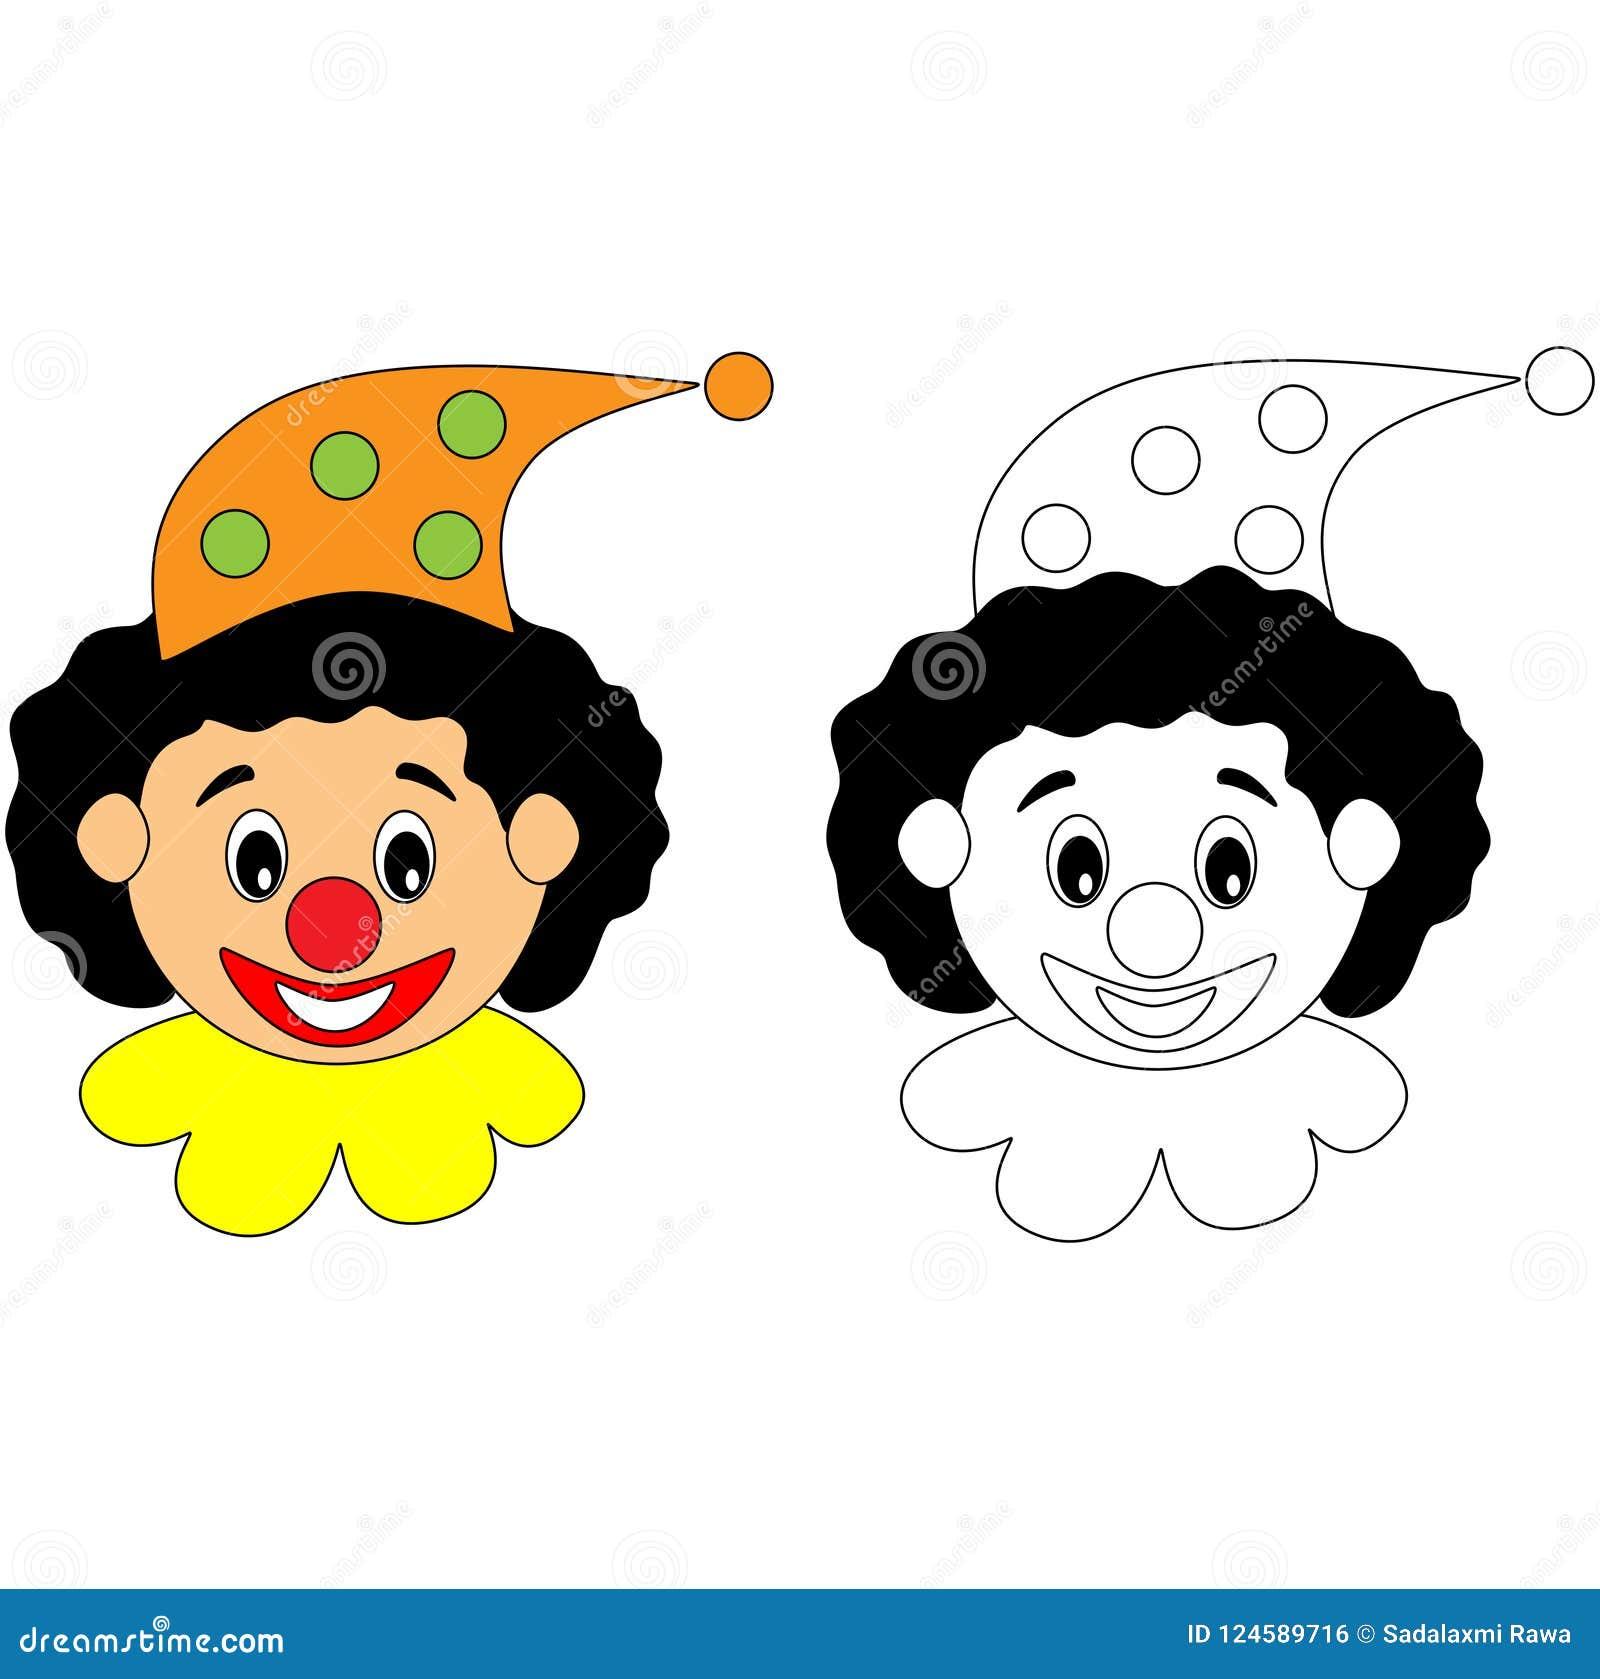 Happy circus clown colouring activity